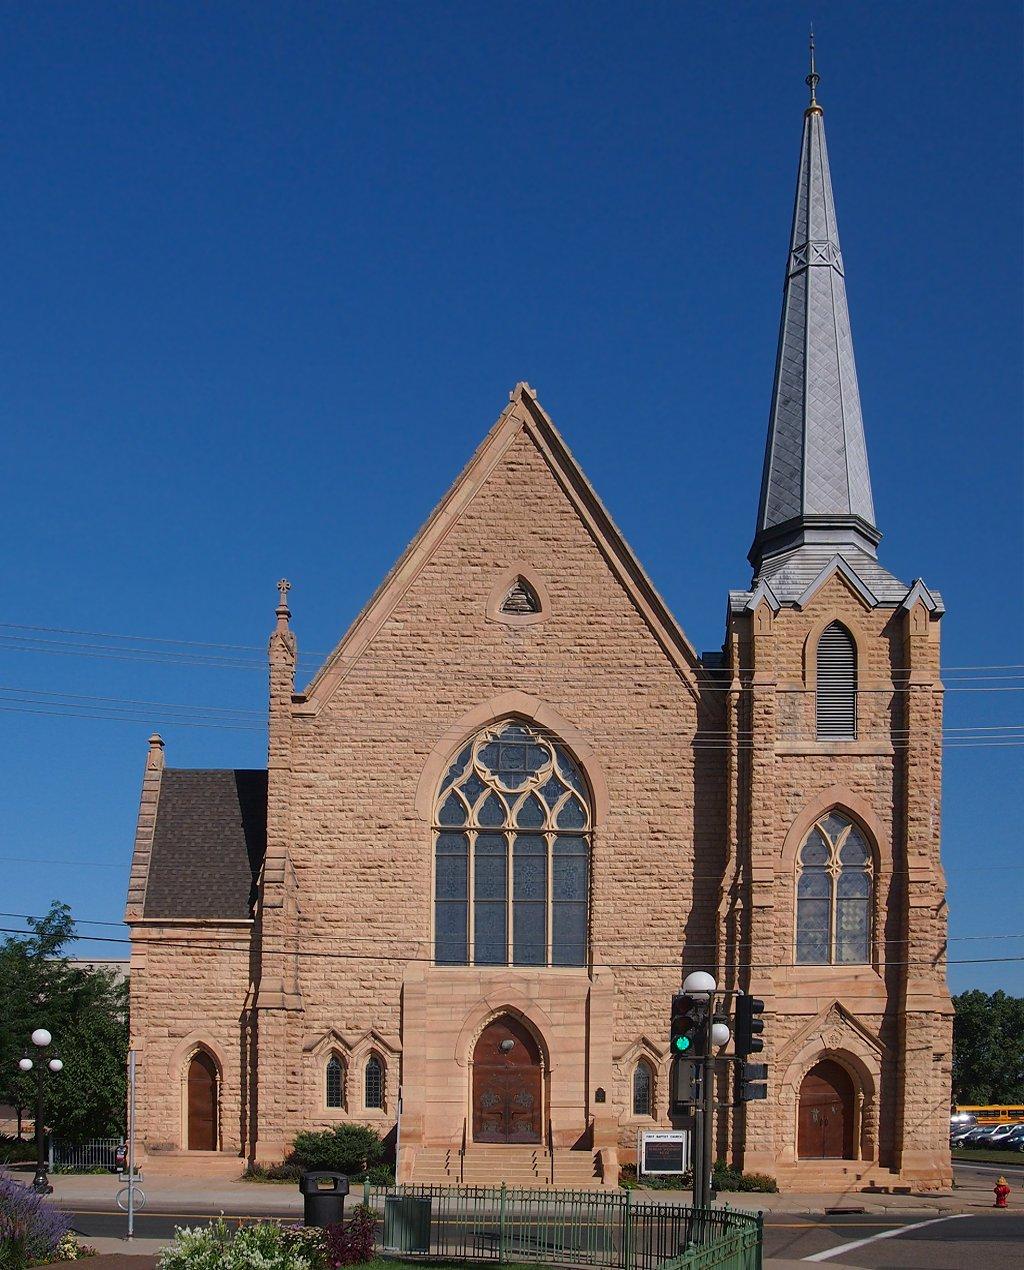 First Baptist Church Wikidata